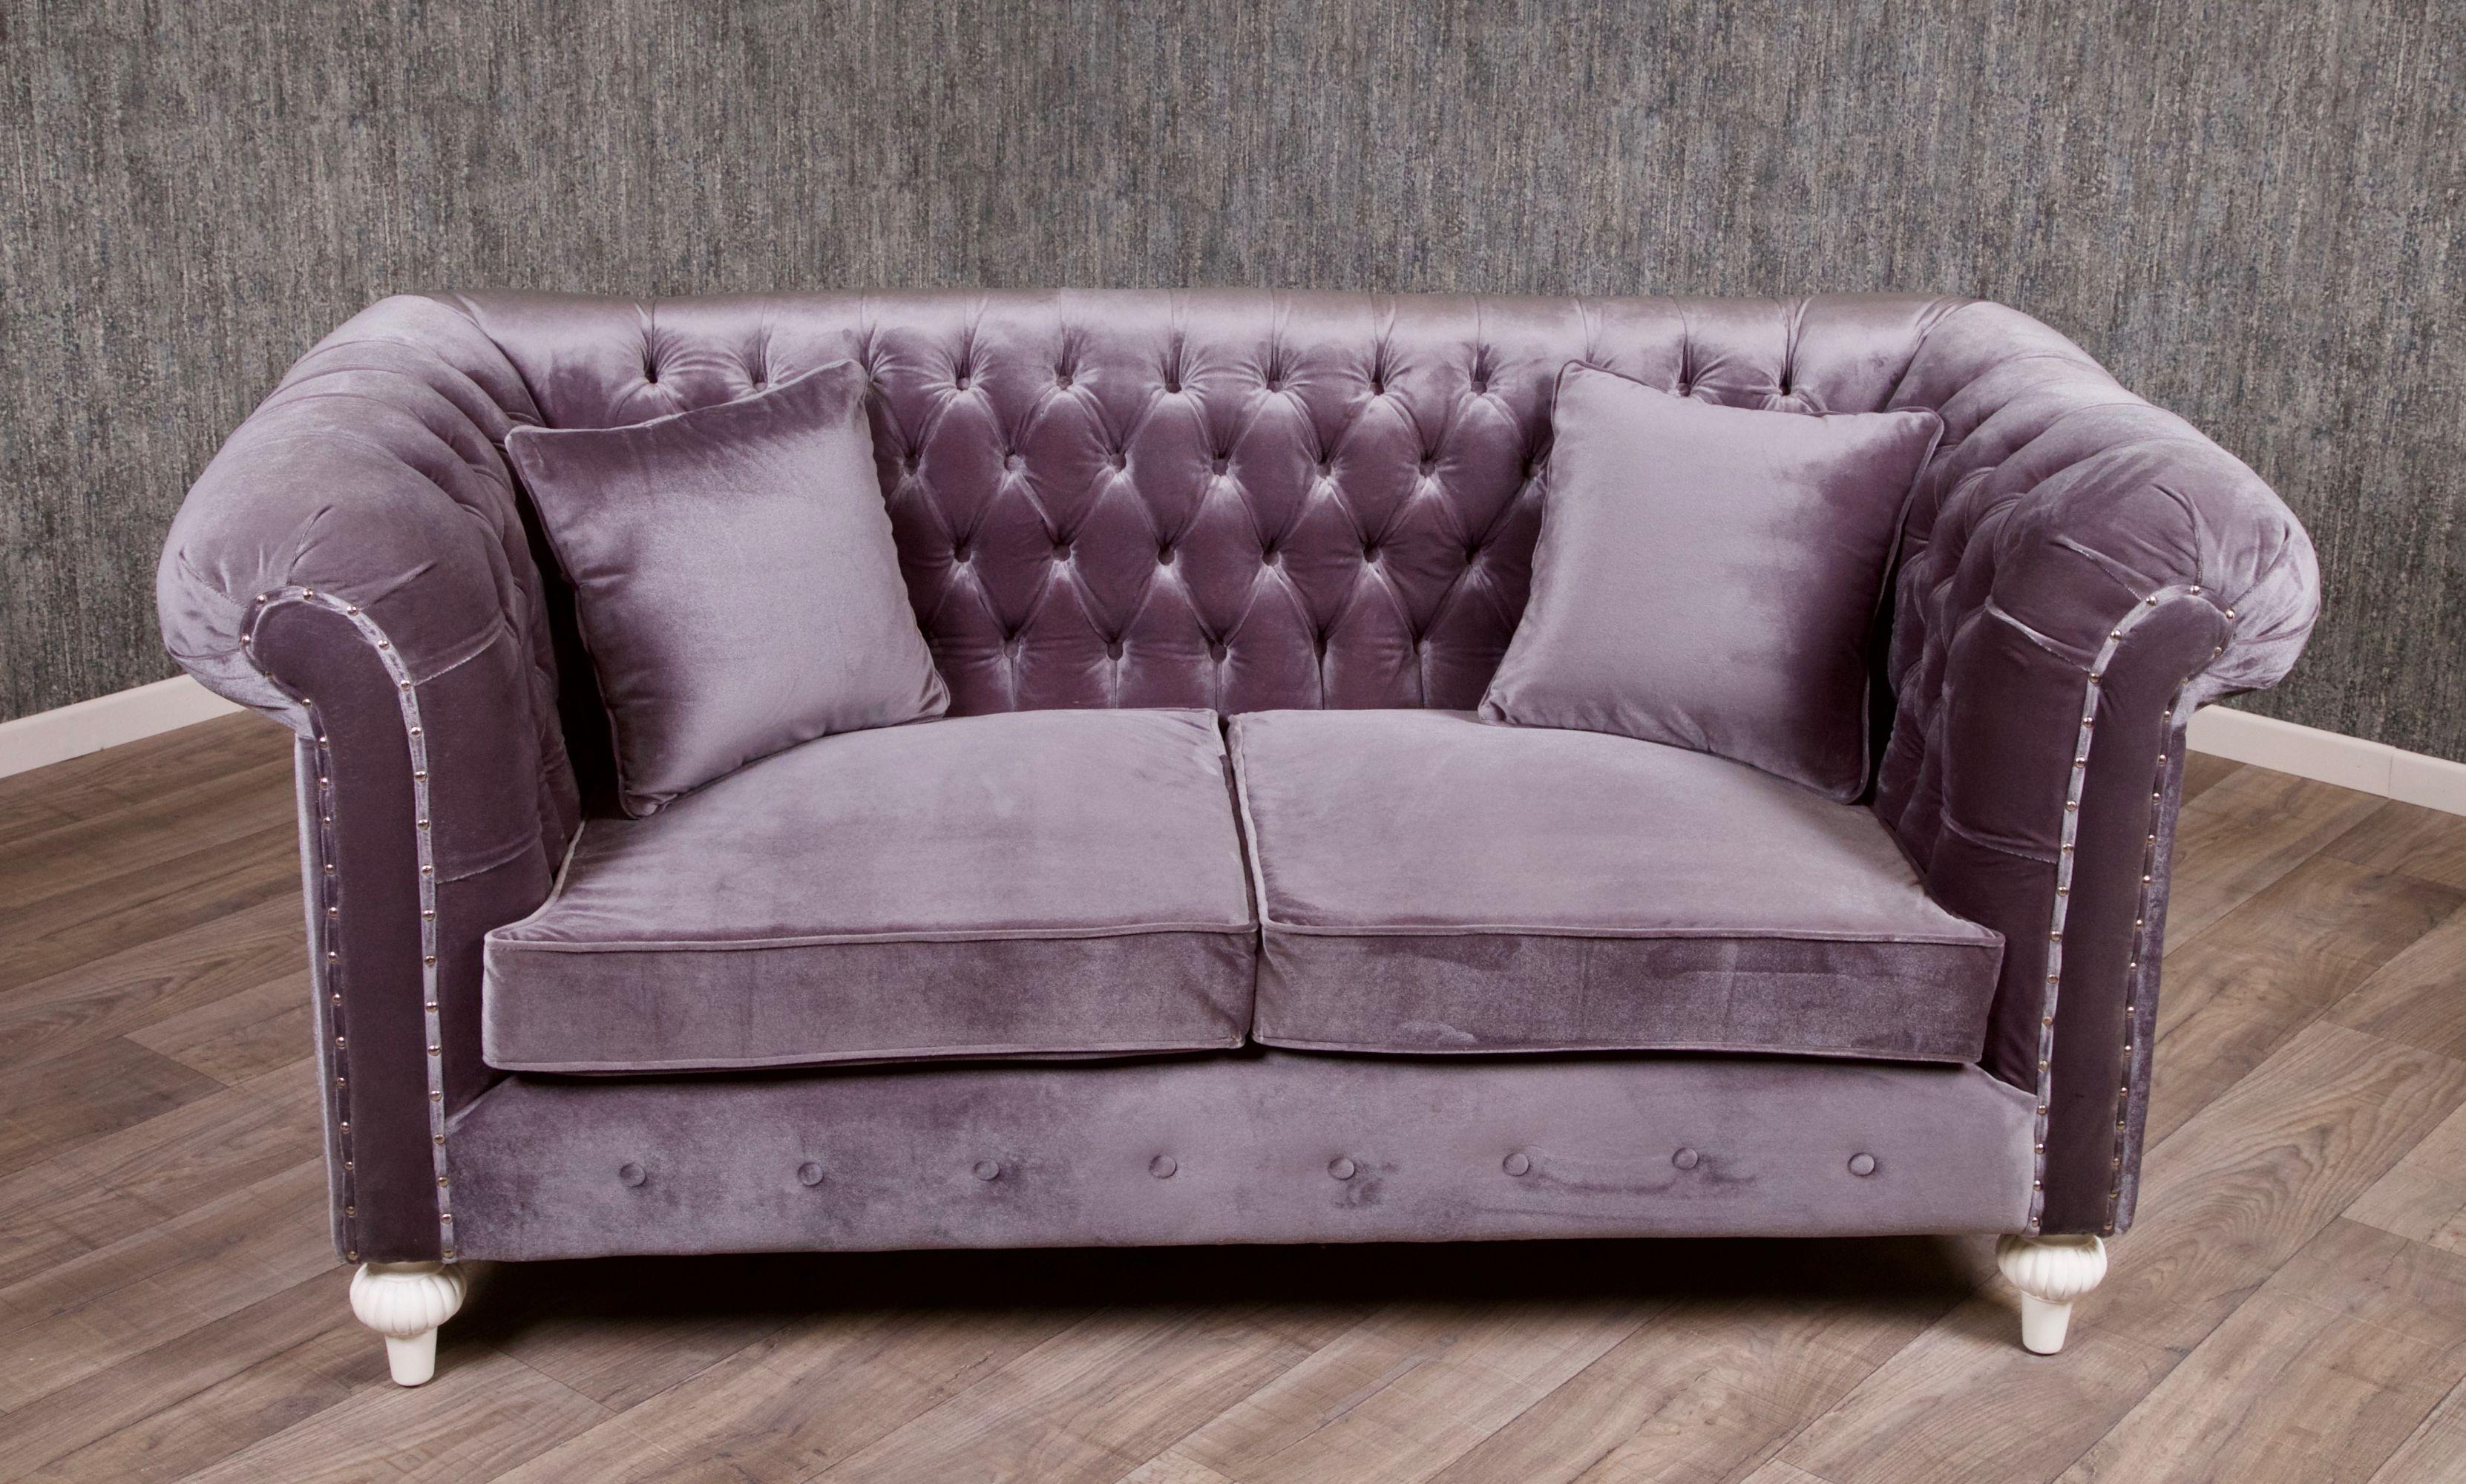 barock chesterfield sofa 2 sitzer empire grau sofas sofas sessel chaiselongue shop. Black Bedroom Furniture Sets. Home Design Ideas